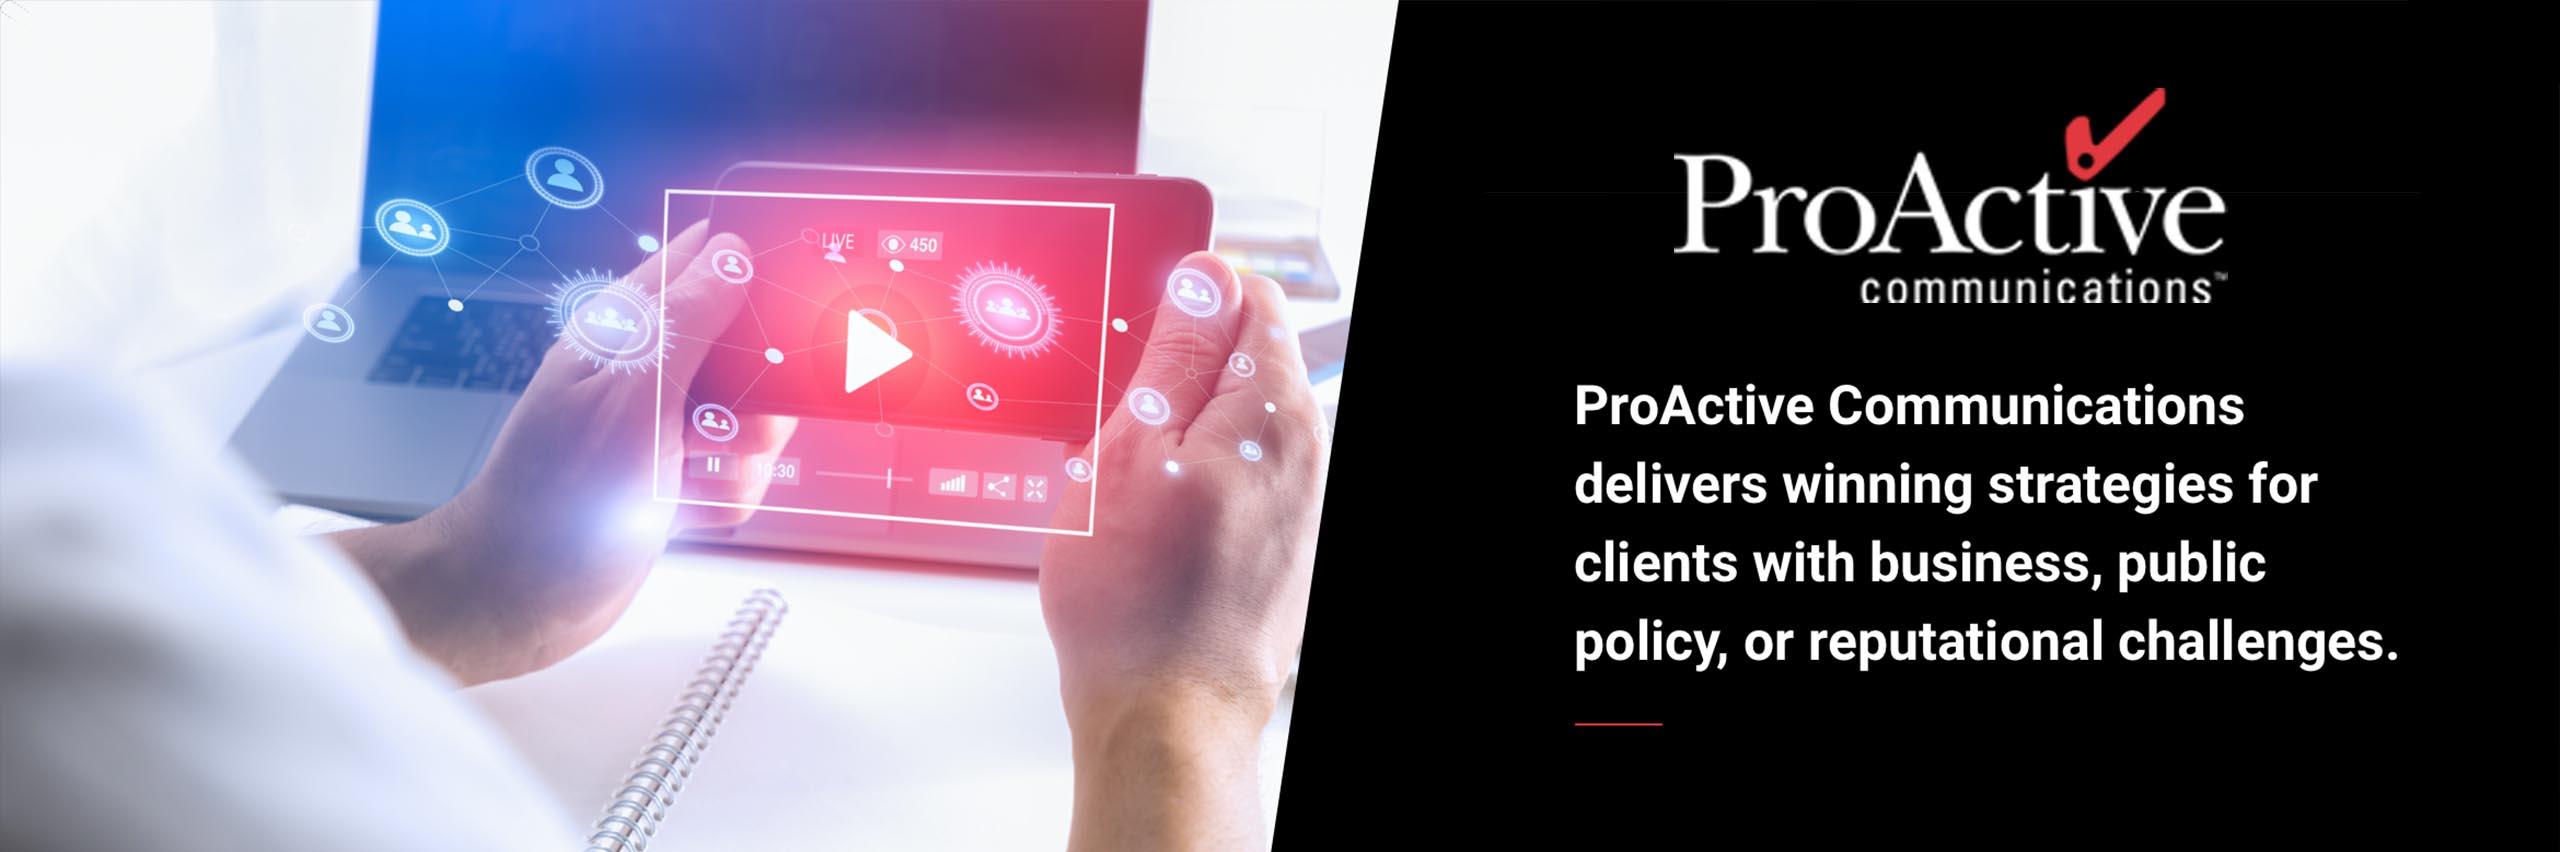 ProActive_Communications_TV-header2